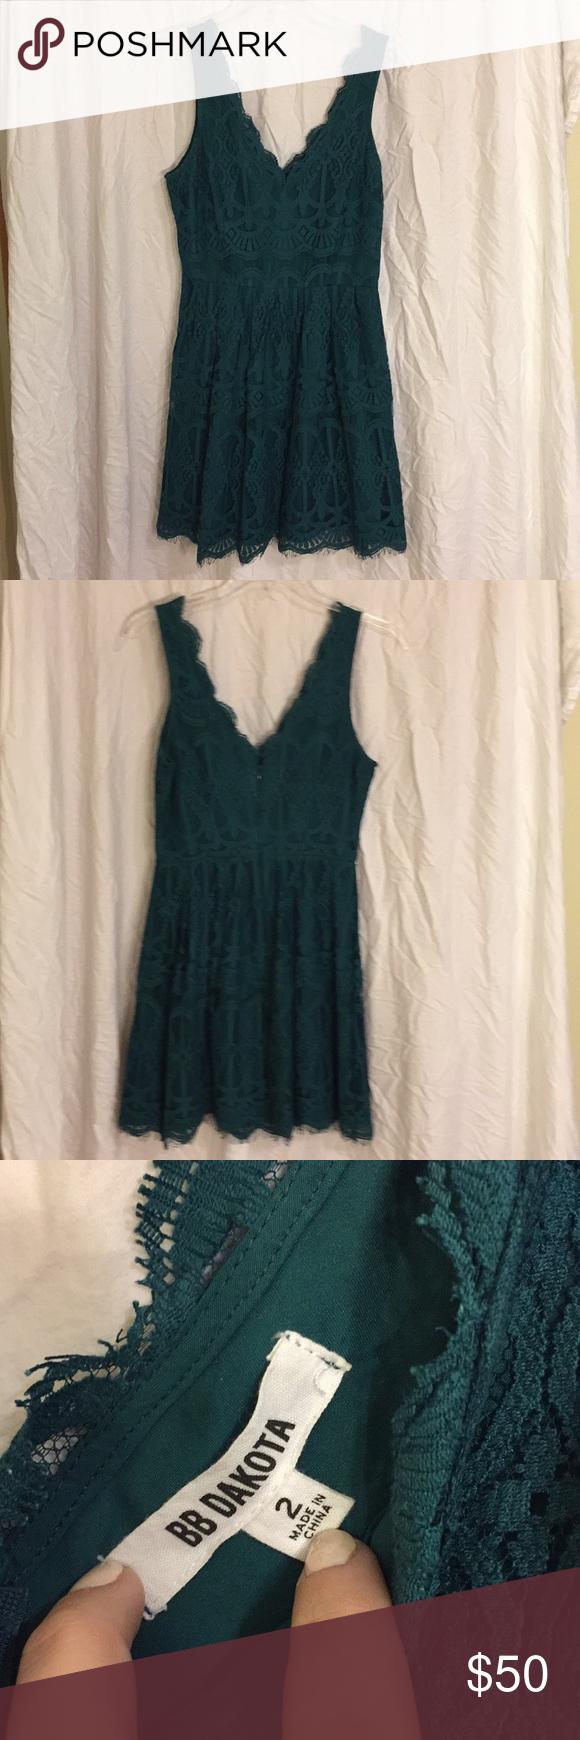 Green dress with lace overlay  BB Dakota Hunter Green lace overlay dress  Lace overlay dress